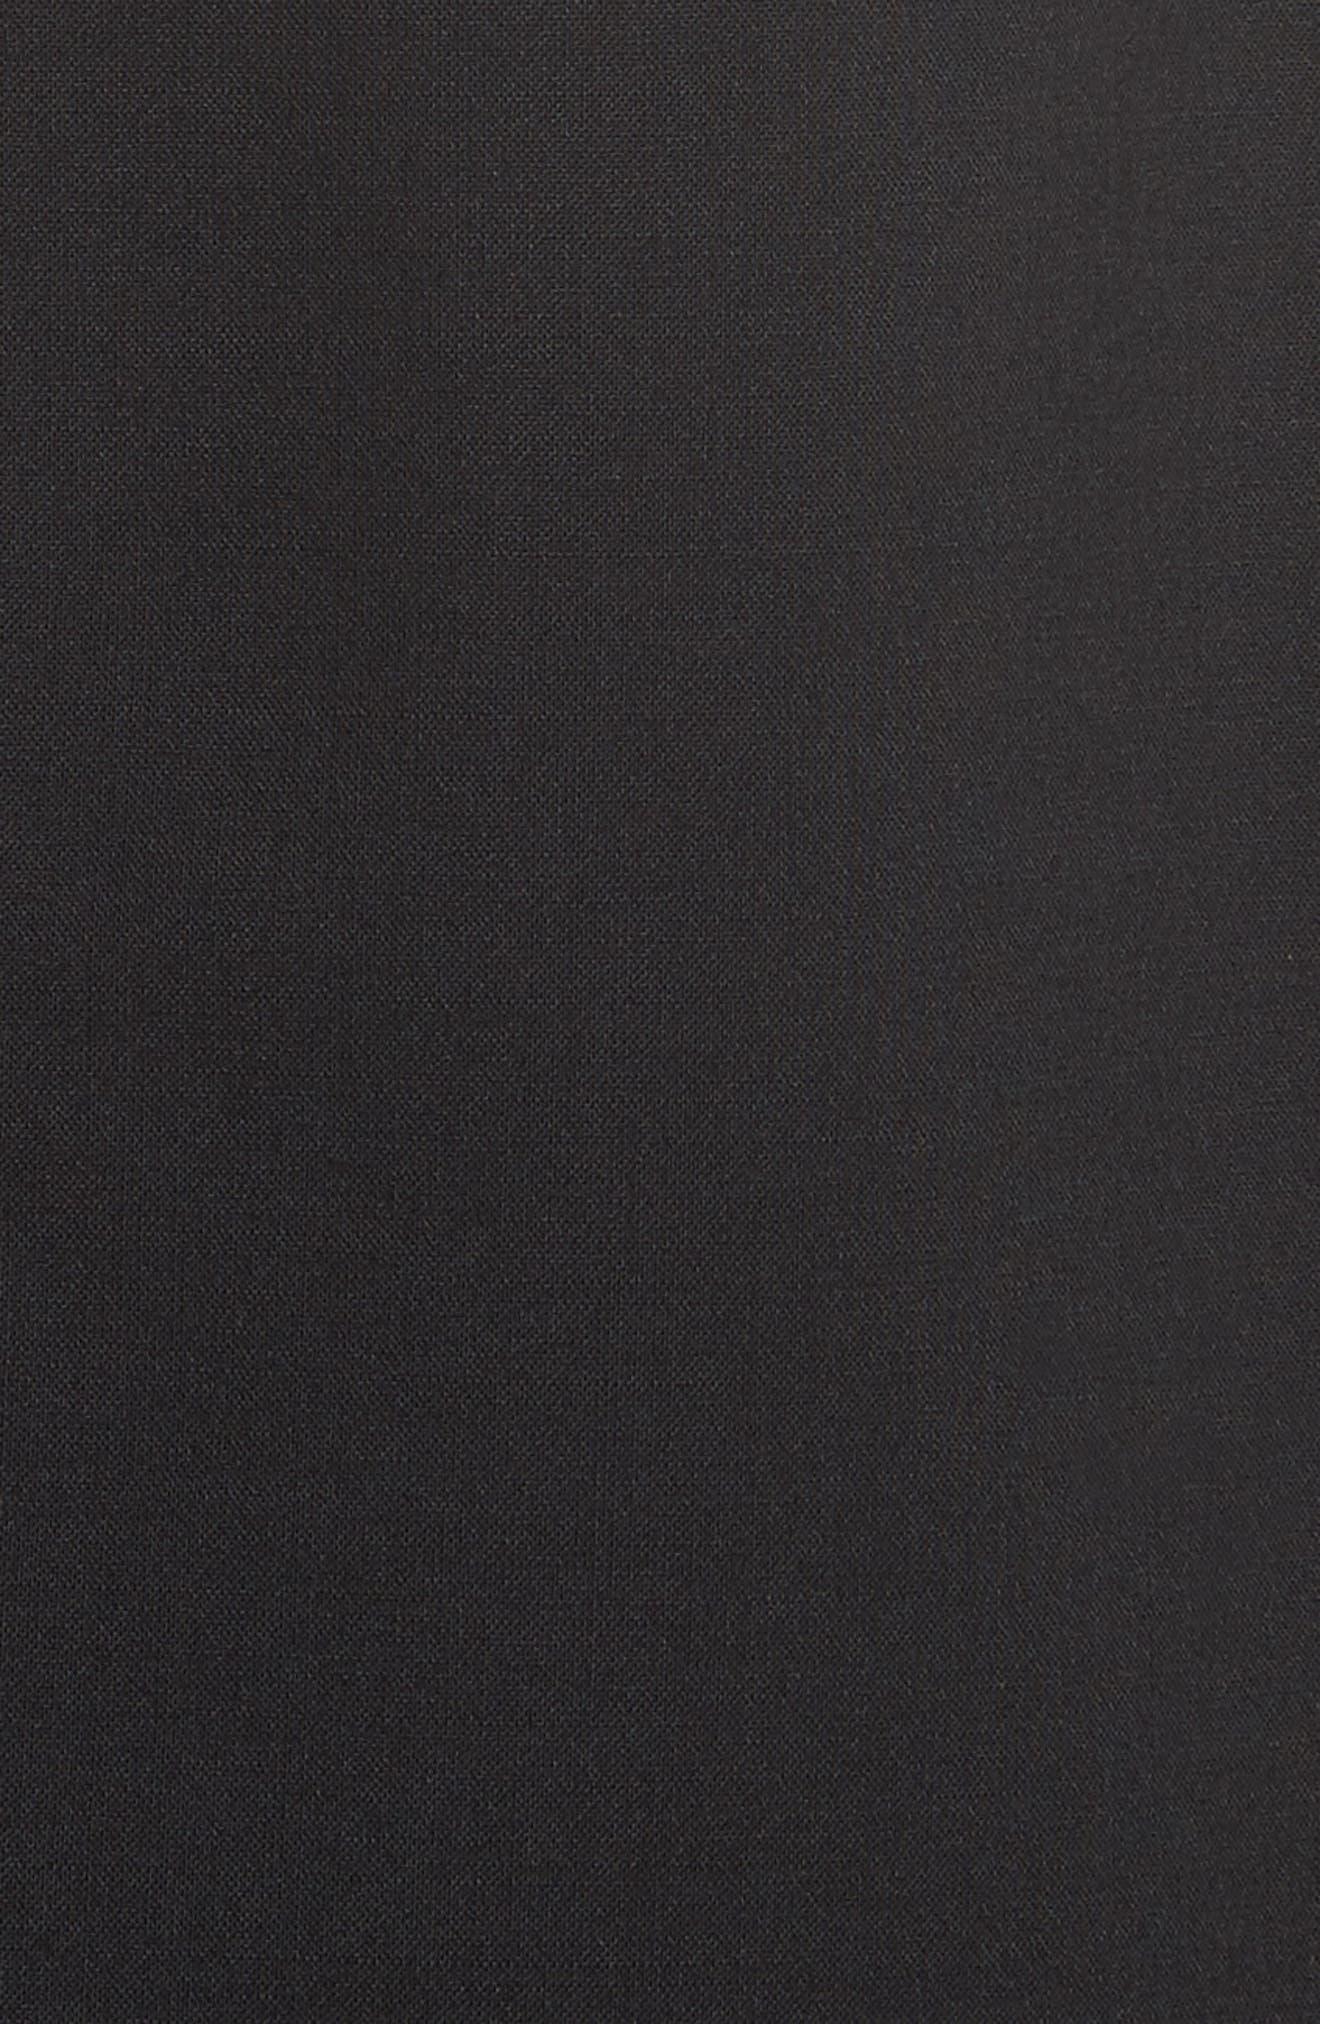 Hook Detail Stretch Wool Long Vest,                             Alternate thumbnail 5, color,                             Black/ Black